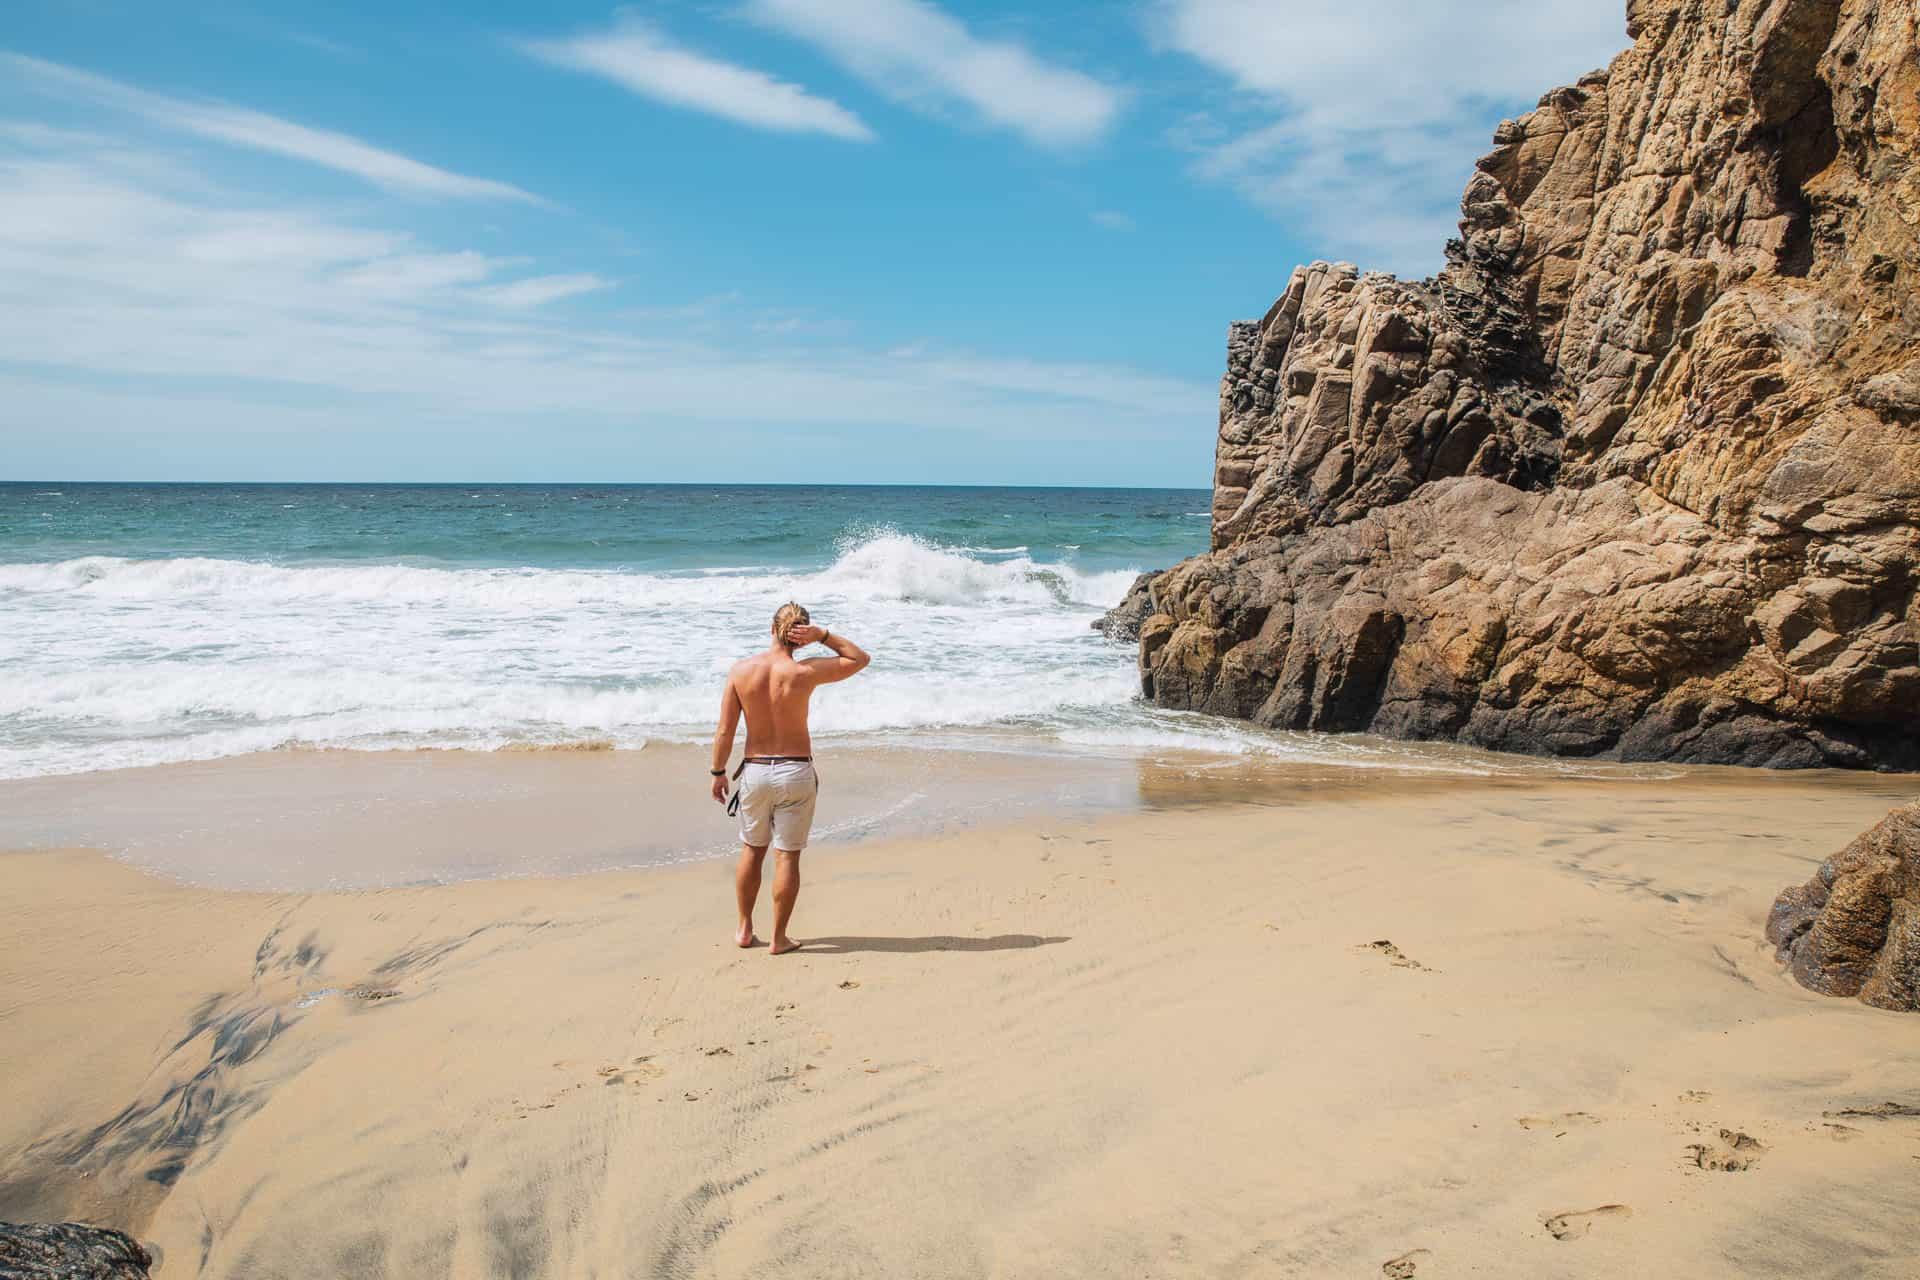 playa sayulita, sayulita playa, sayulita beach, playa sayulita nayarit, playa malpaso